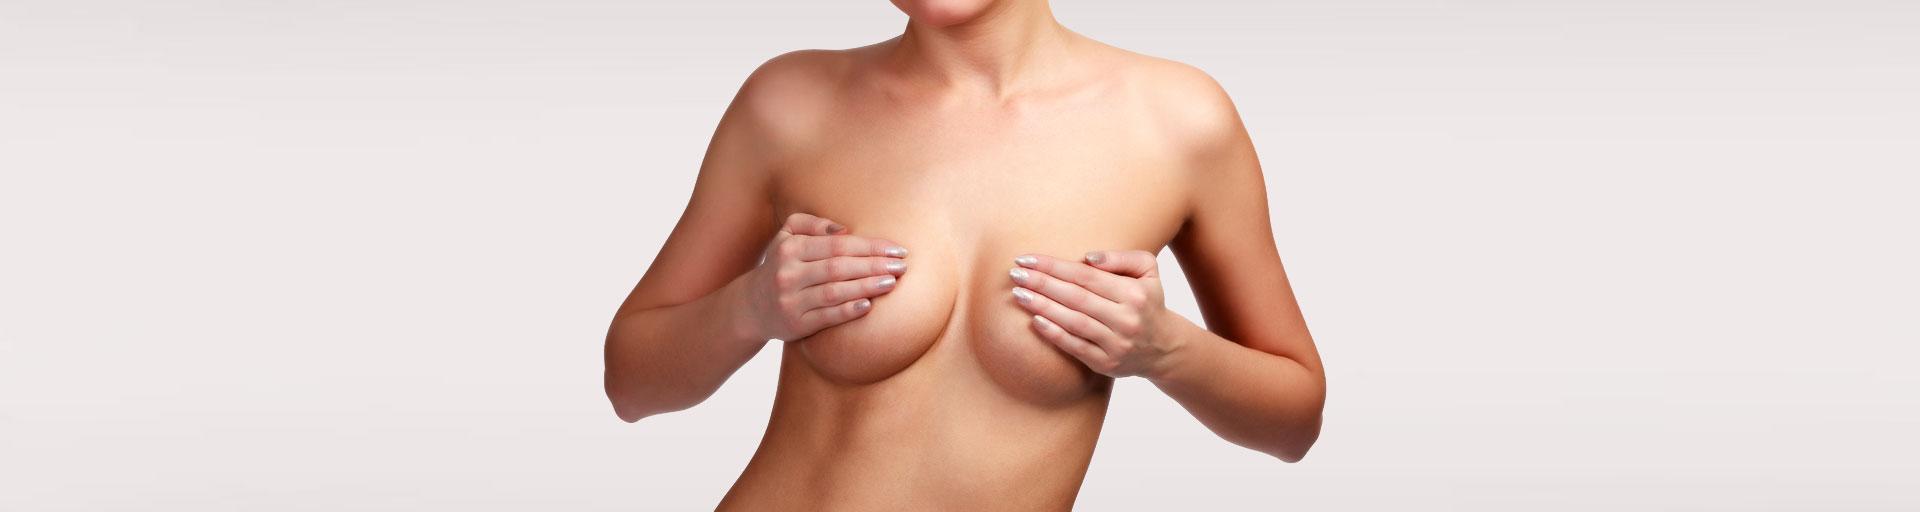 brust-aesthetische-chirurgie-b